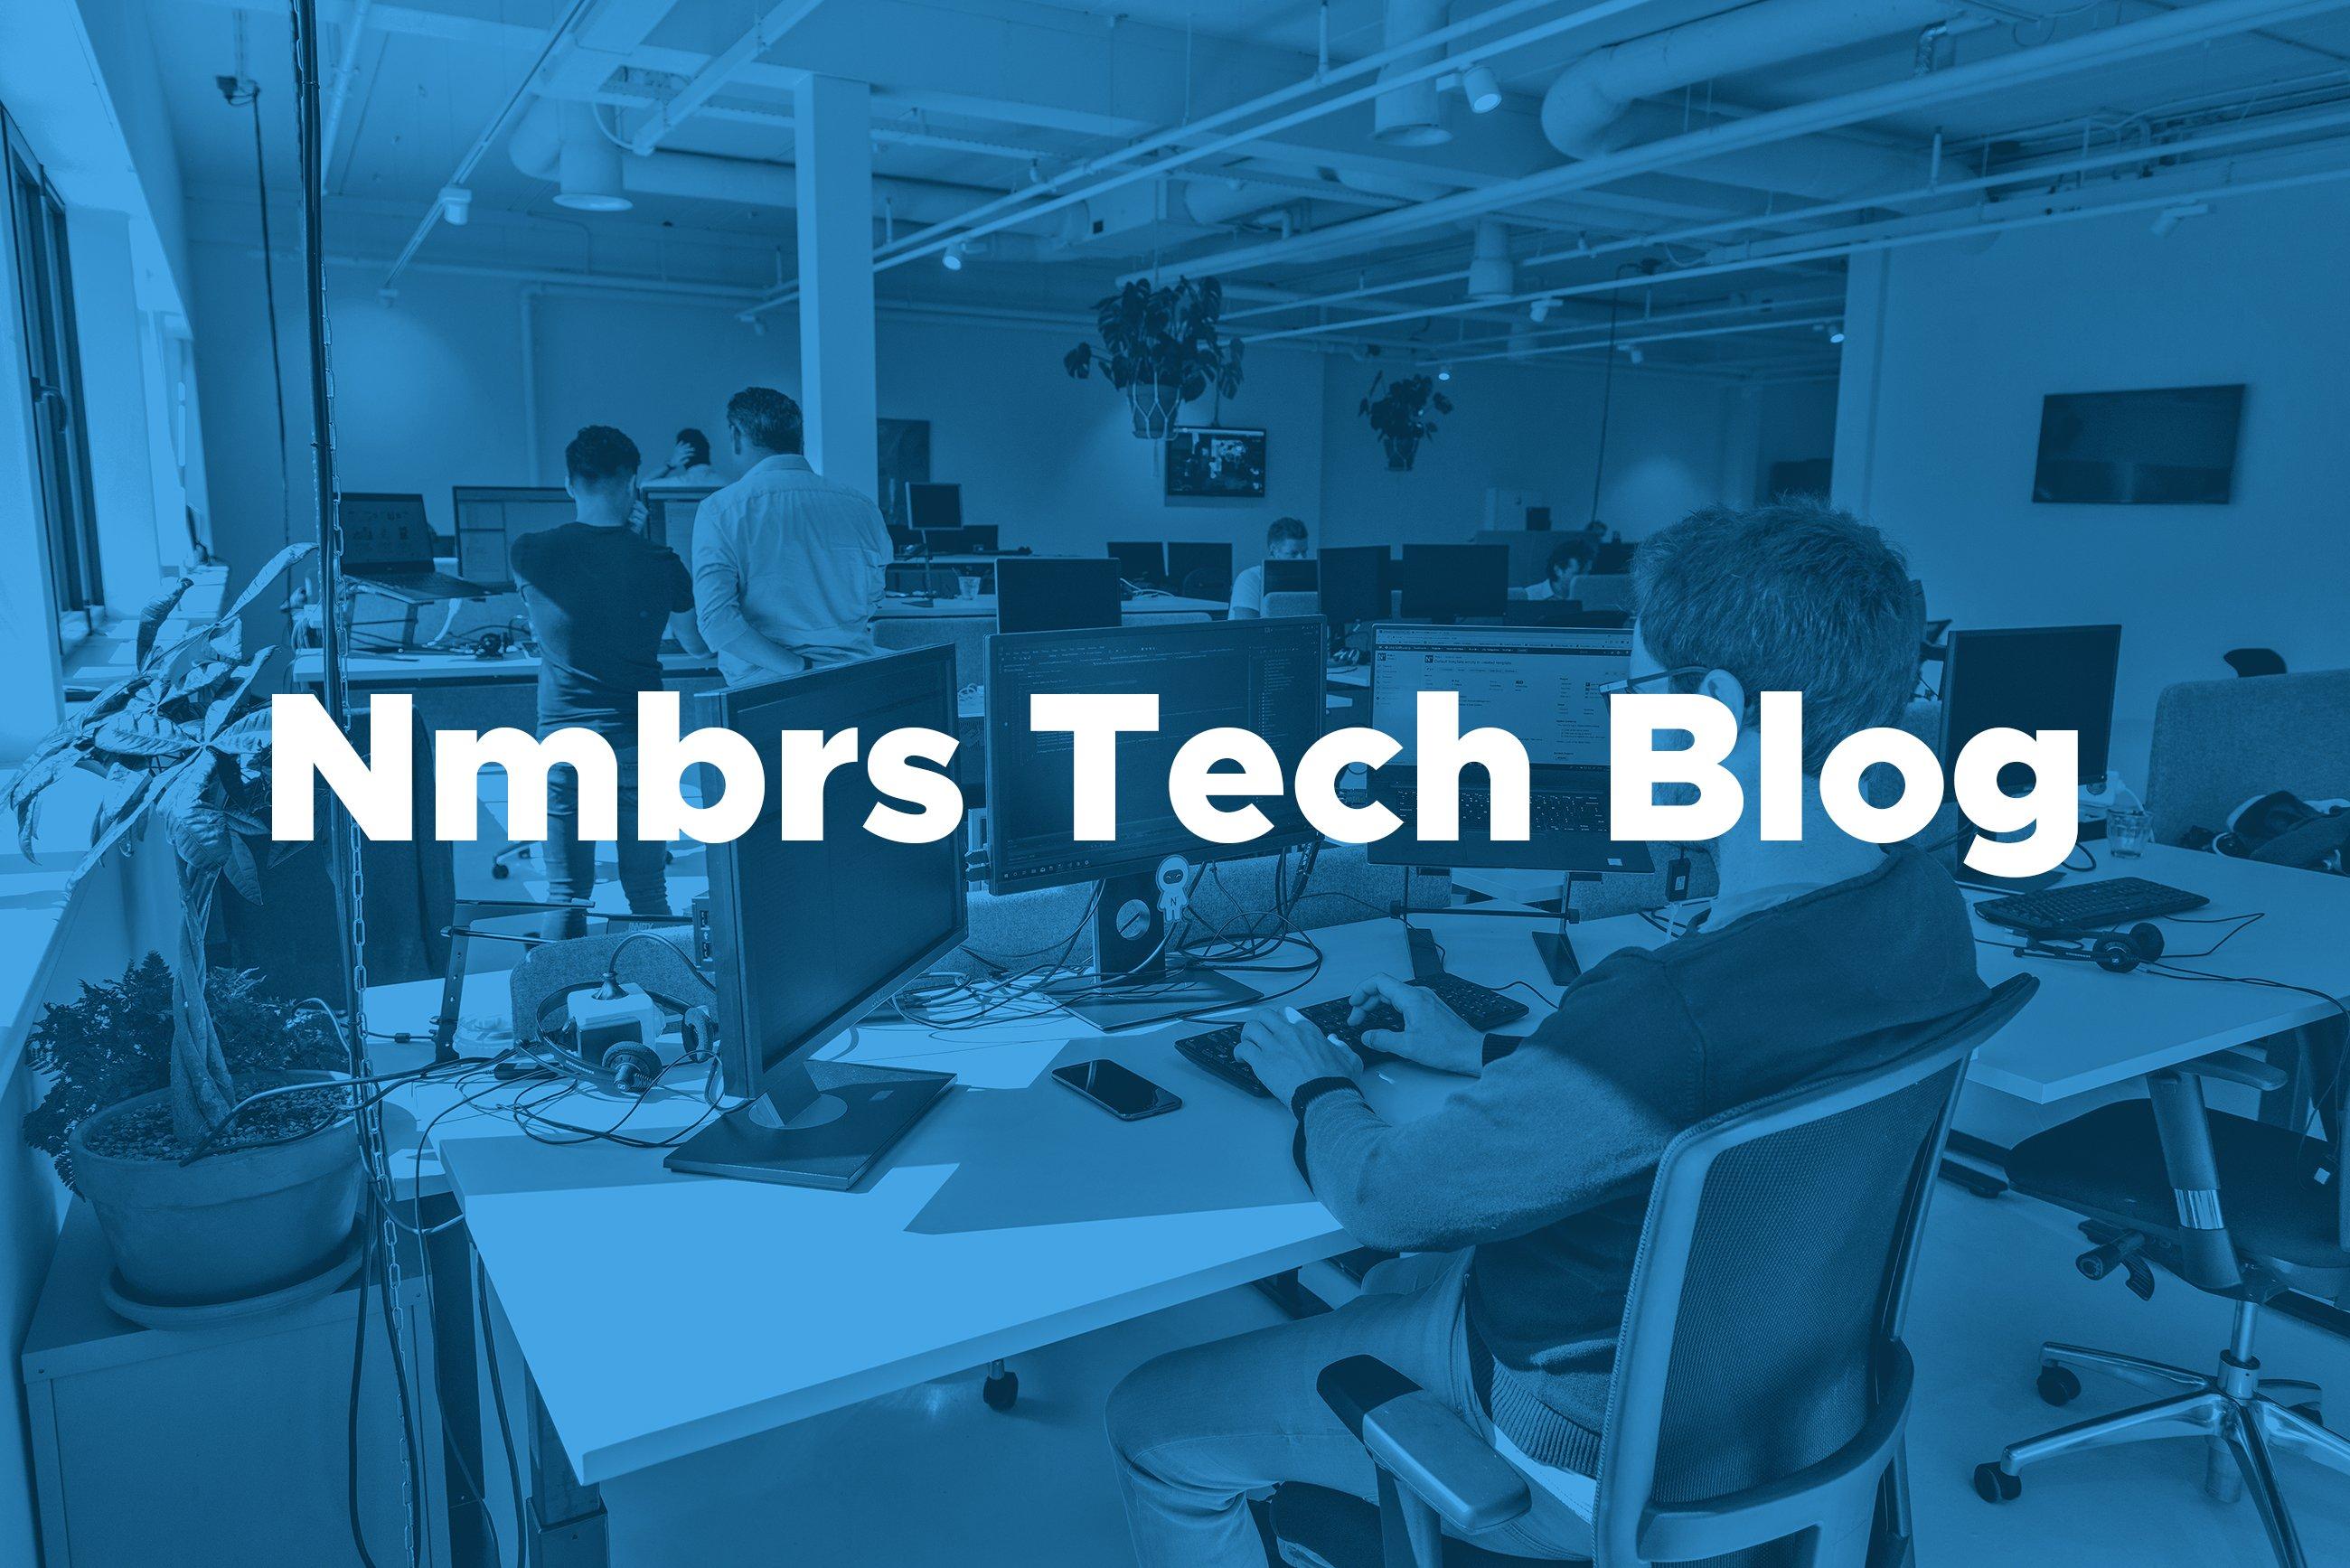 nmbrs-career-website-company-culture-tech-blog-1